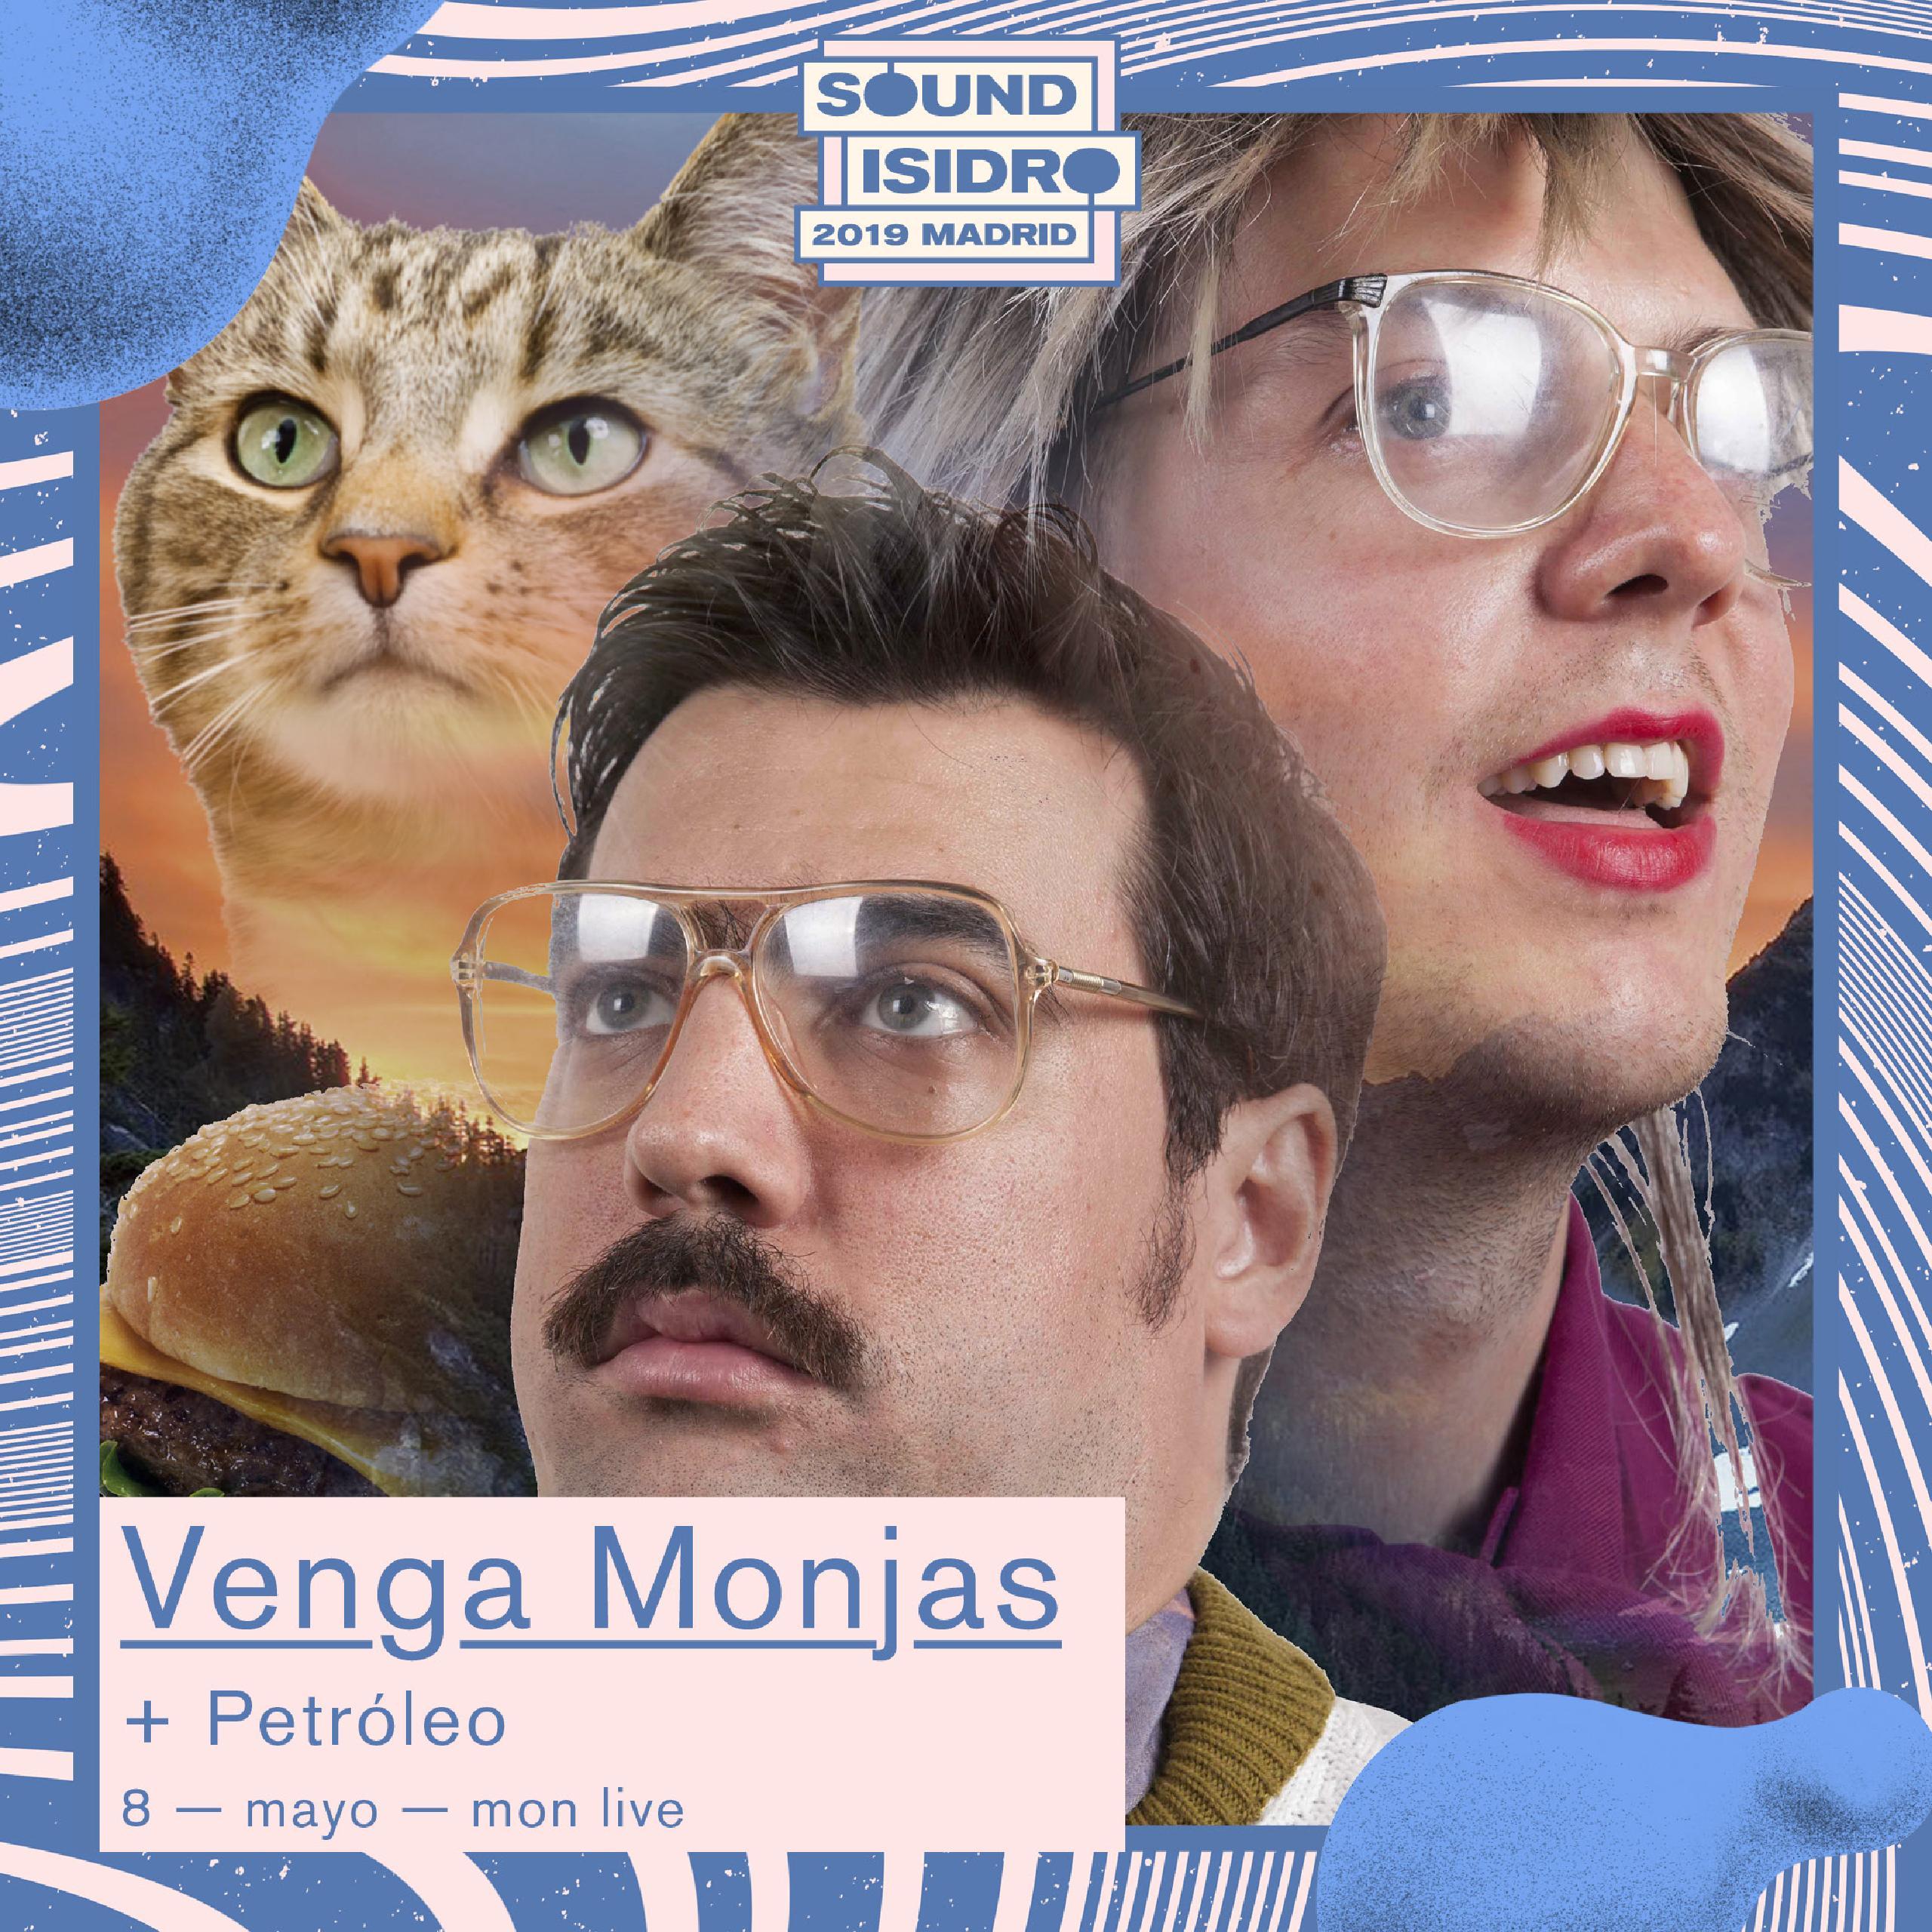 Petróleo Venga Monjas concierto Madrid Sound Isidro Mon Live